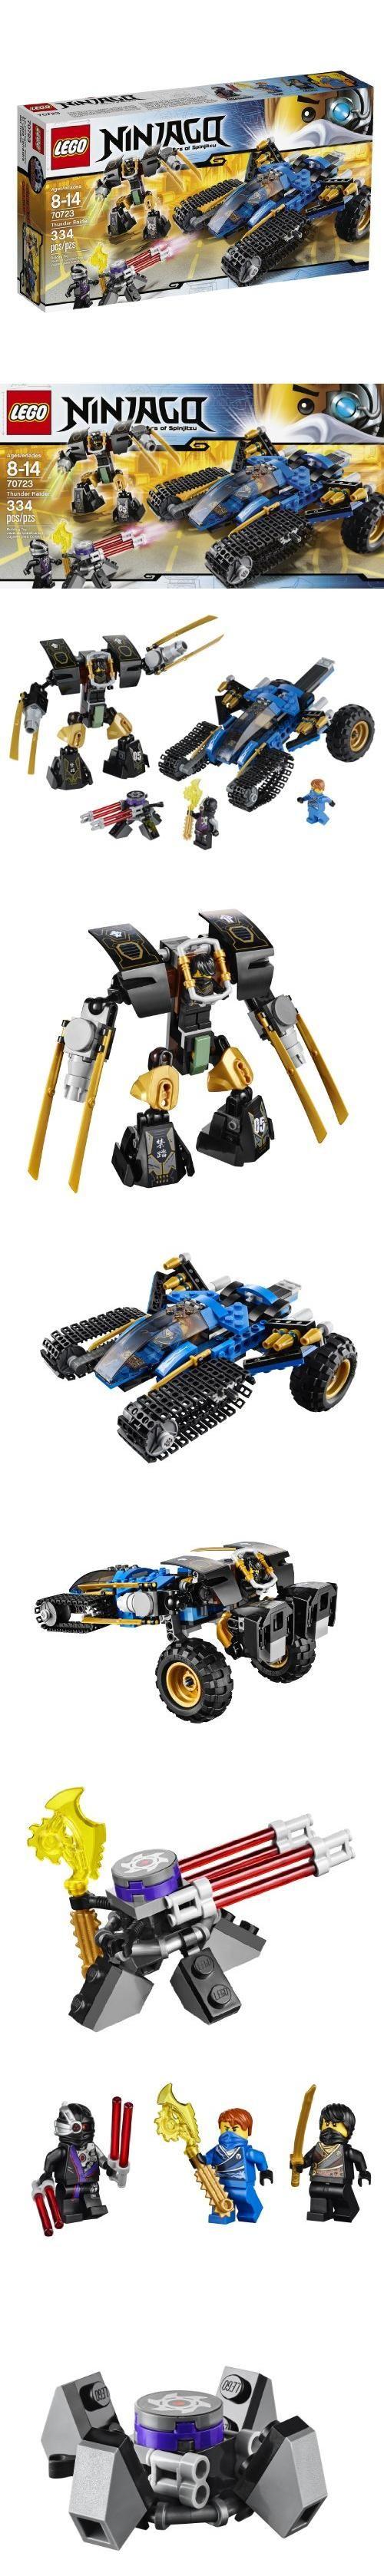 LEGO Ninjago 70723 Thunder Raider Toy, New Set for Ninjago Rebooted!, #Toys, #Building Sets